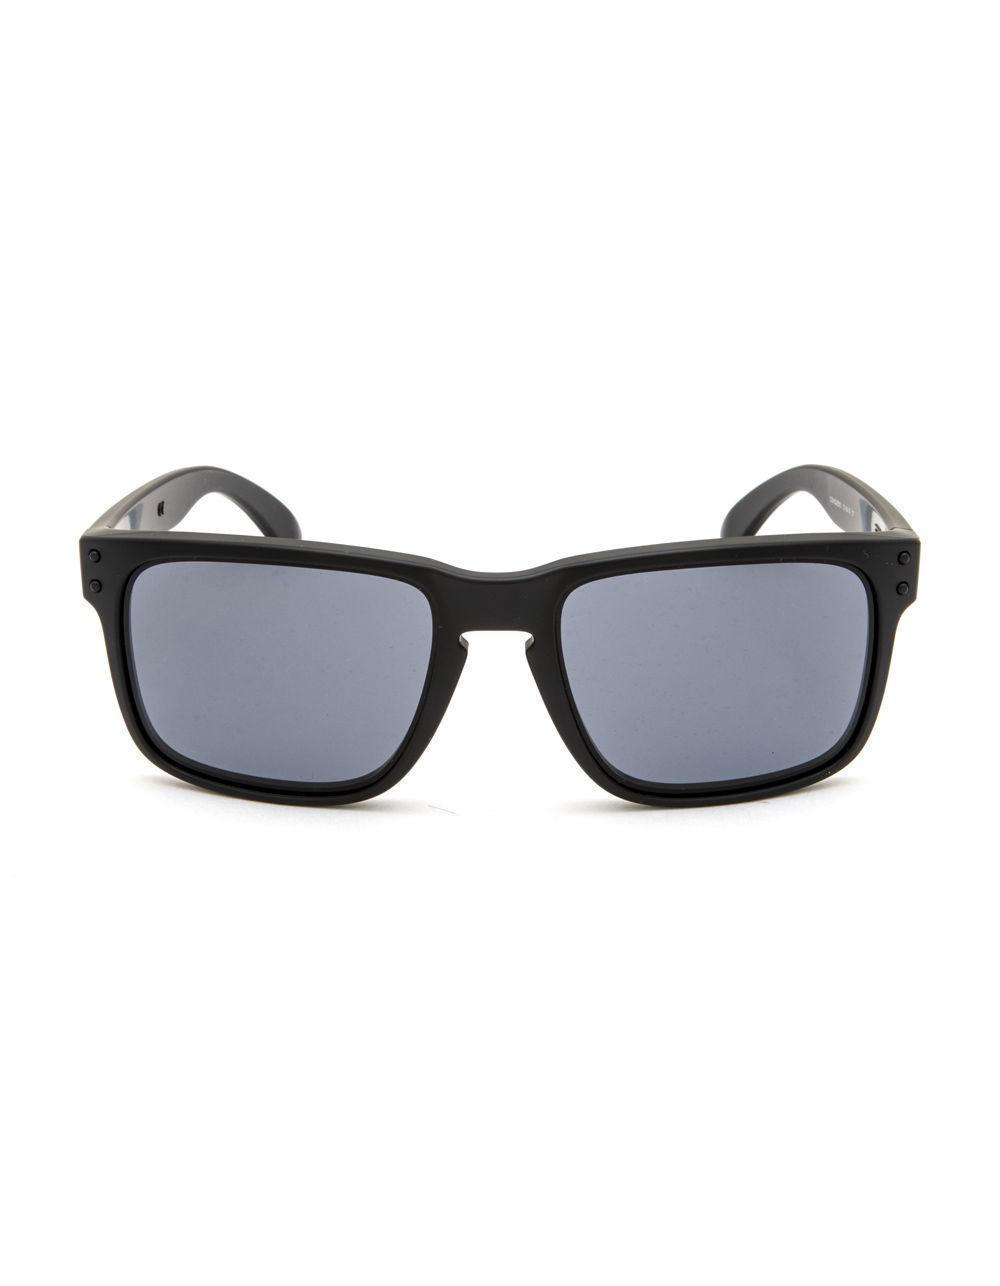 23a378529eb8e Oakley Holbrook Usa Flag Matte Black   Gray Sunglasses in Black for Men -  Lyst